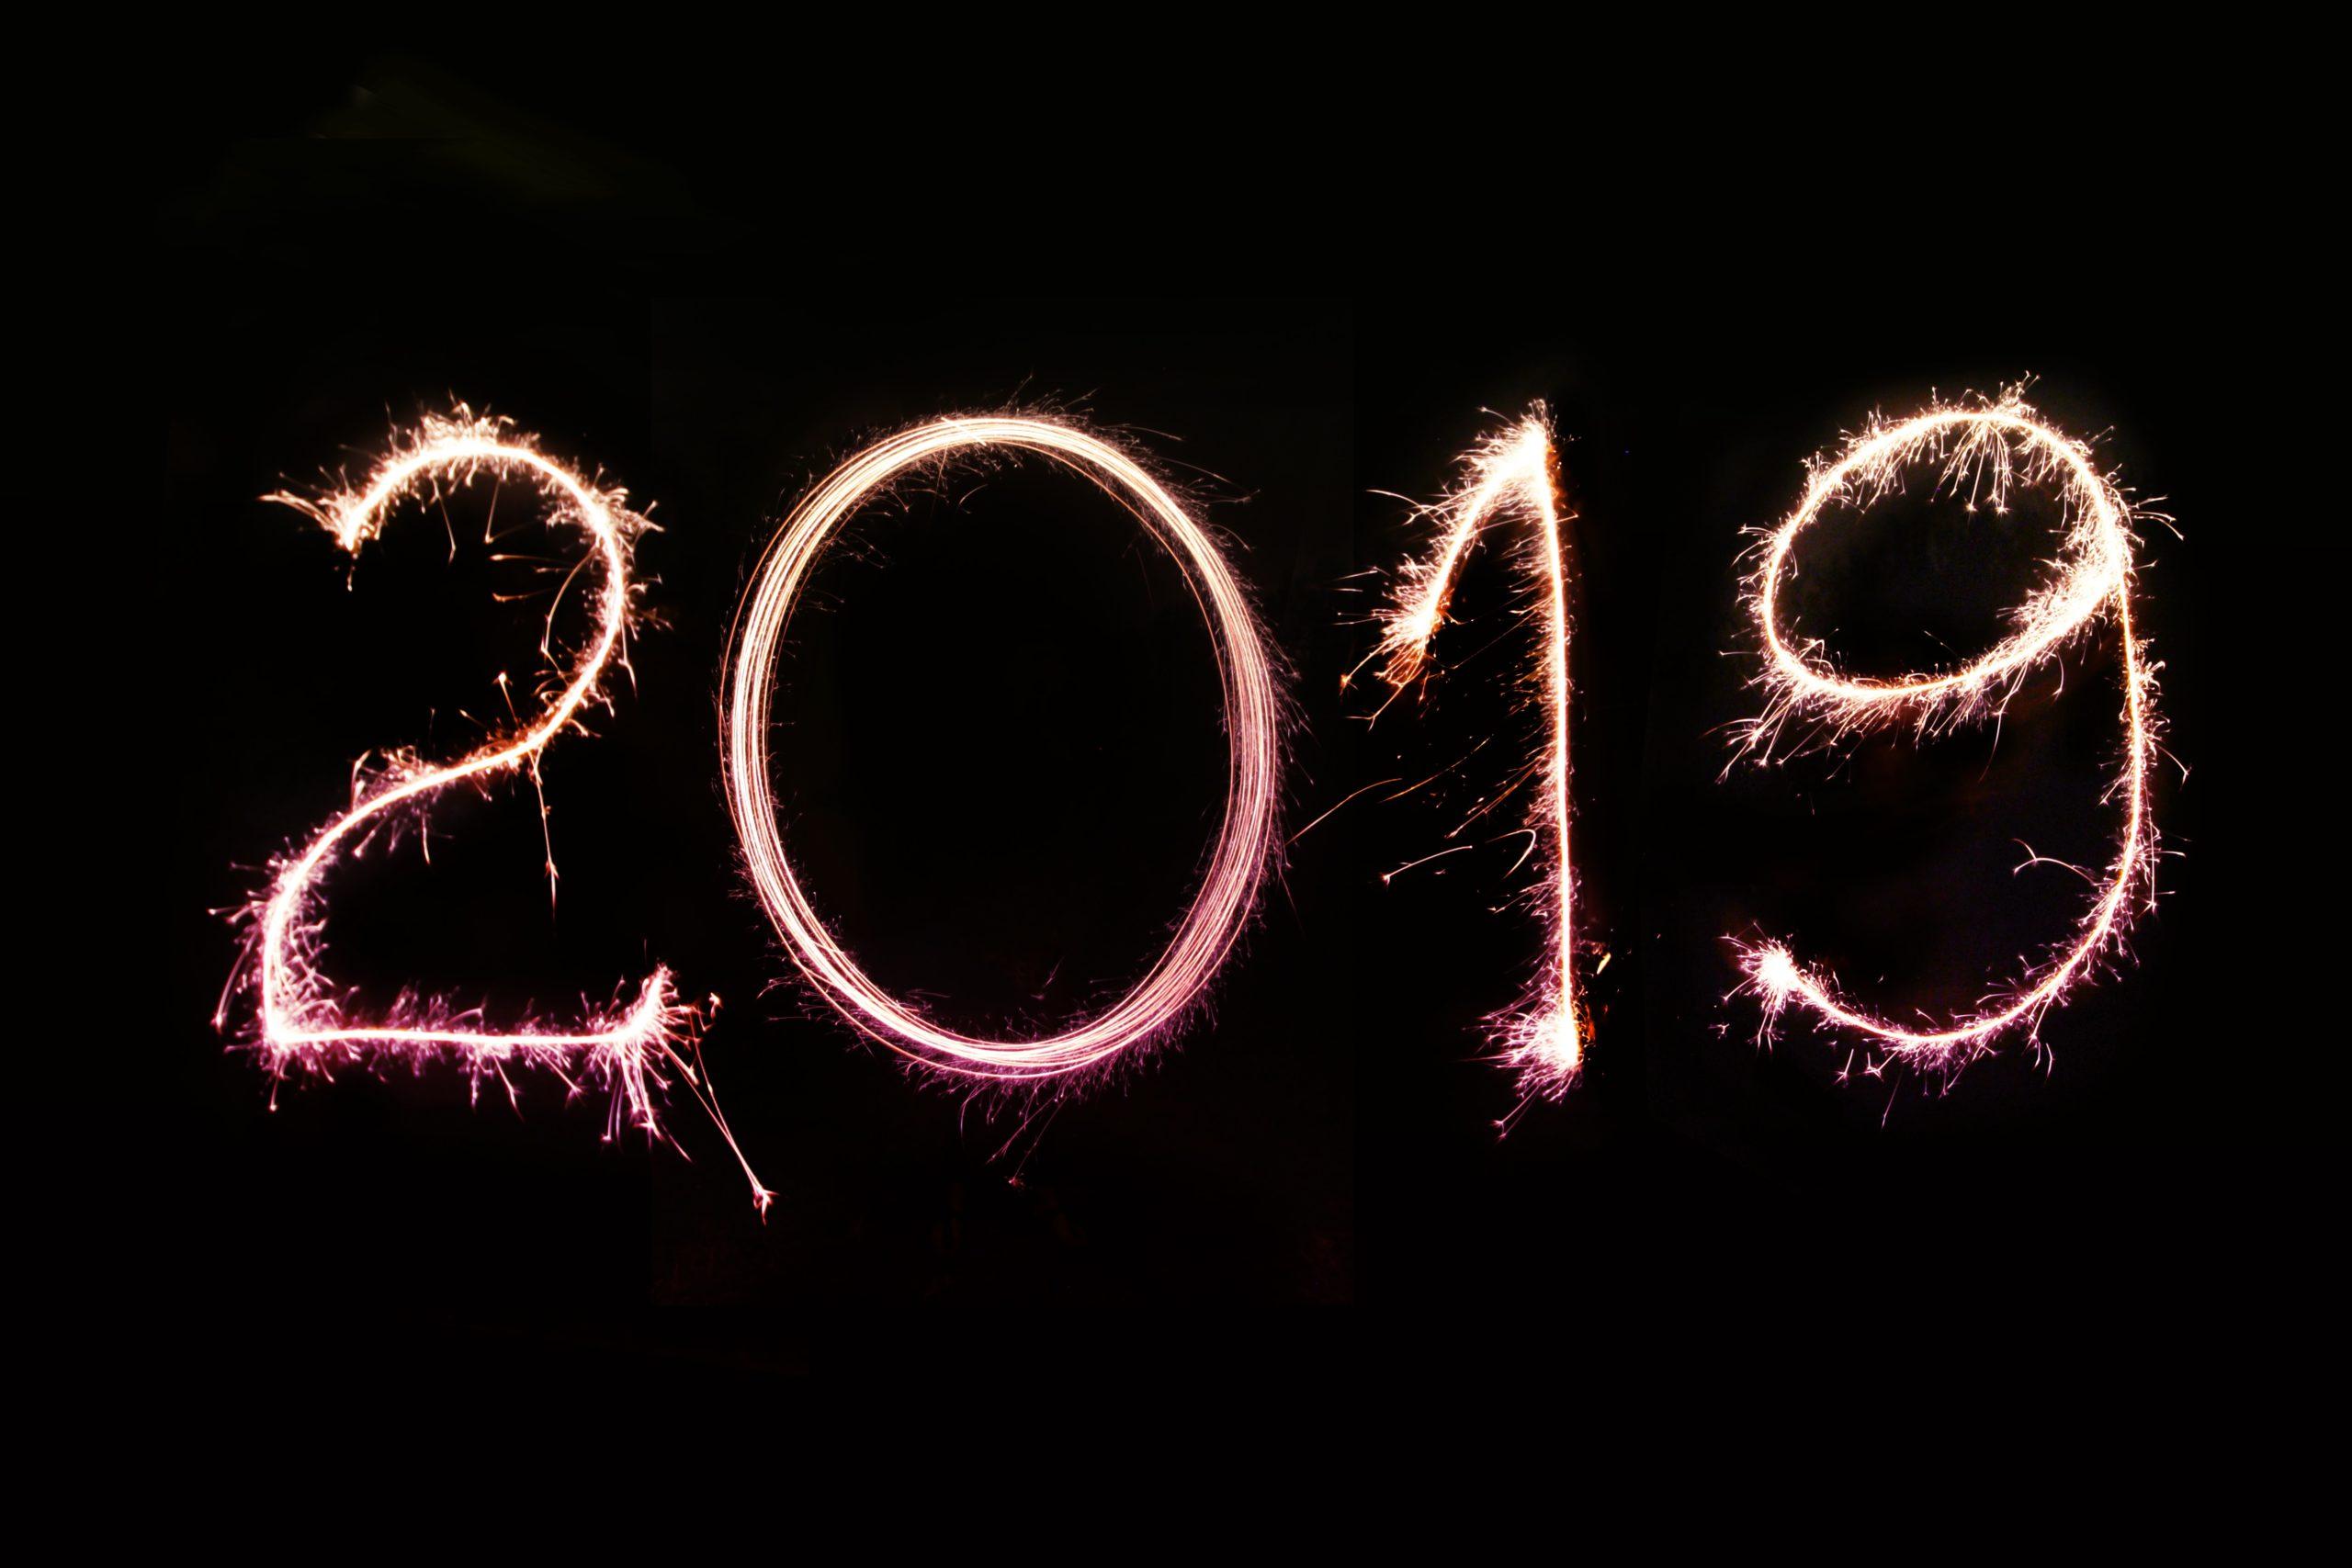 2019 writen in sparkler light on a black background